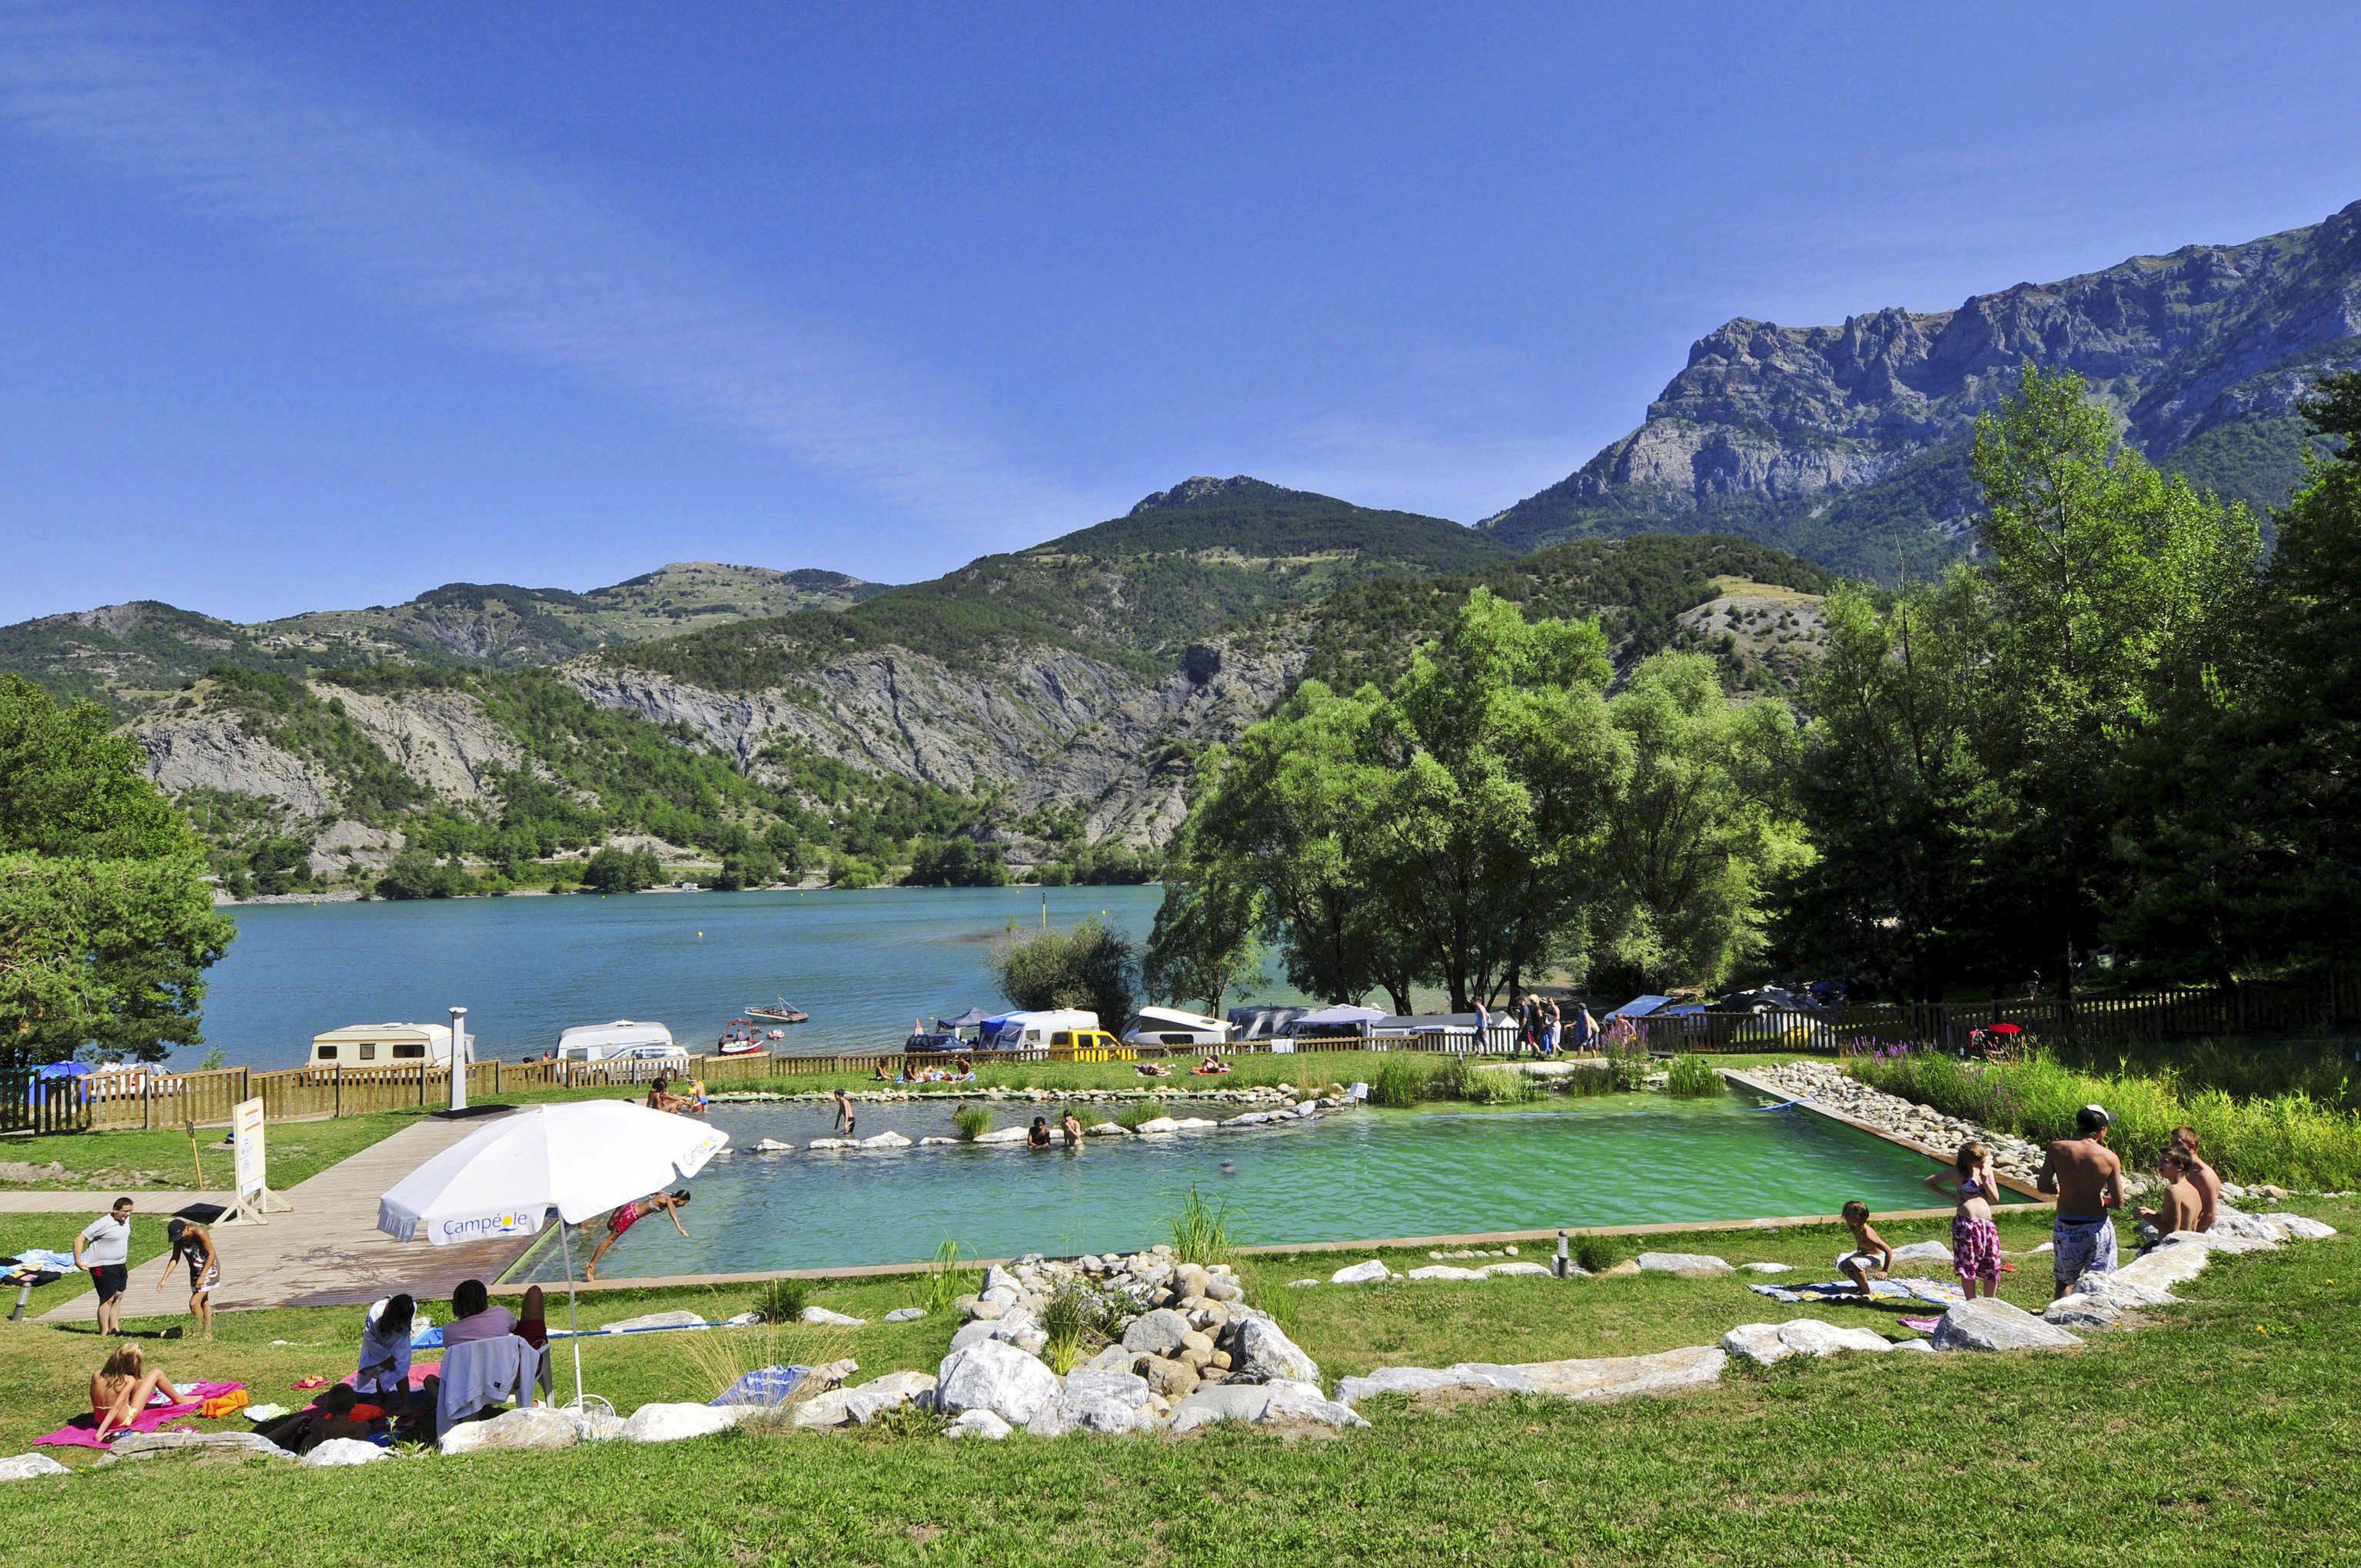 Le lac camping nature avec piscine face au lac de serre - Camping lac serre poncon piscine ...